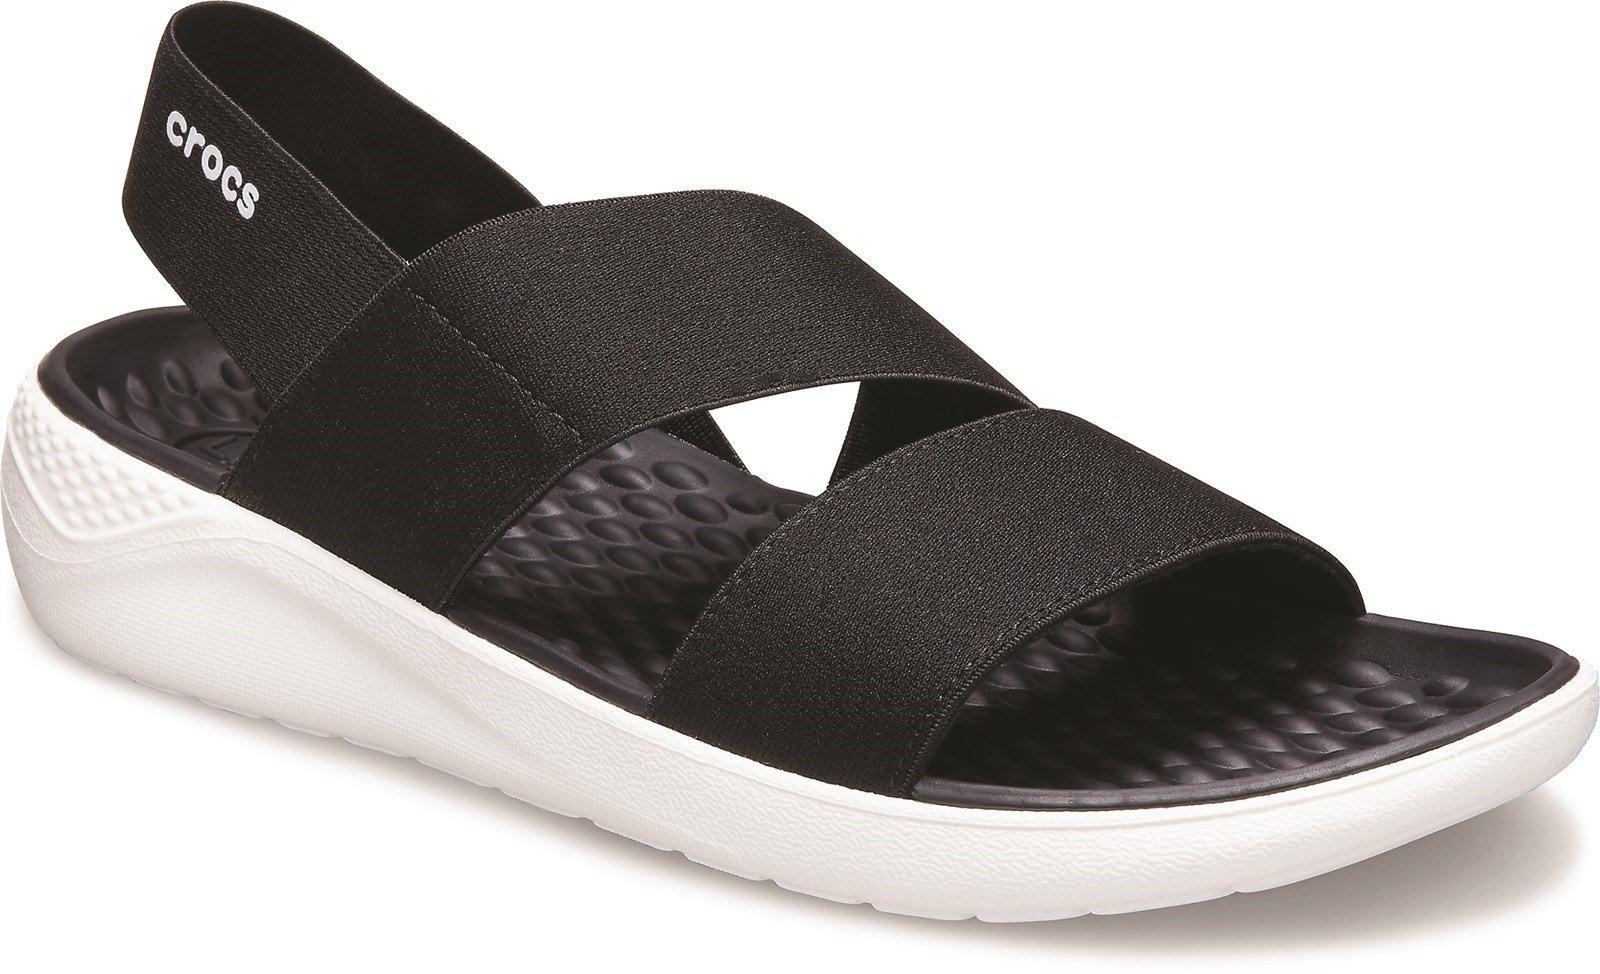 Crocs Women's Lite Ride Stretch Slip On Sandal Various Colours 31455 - Black 3